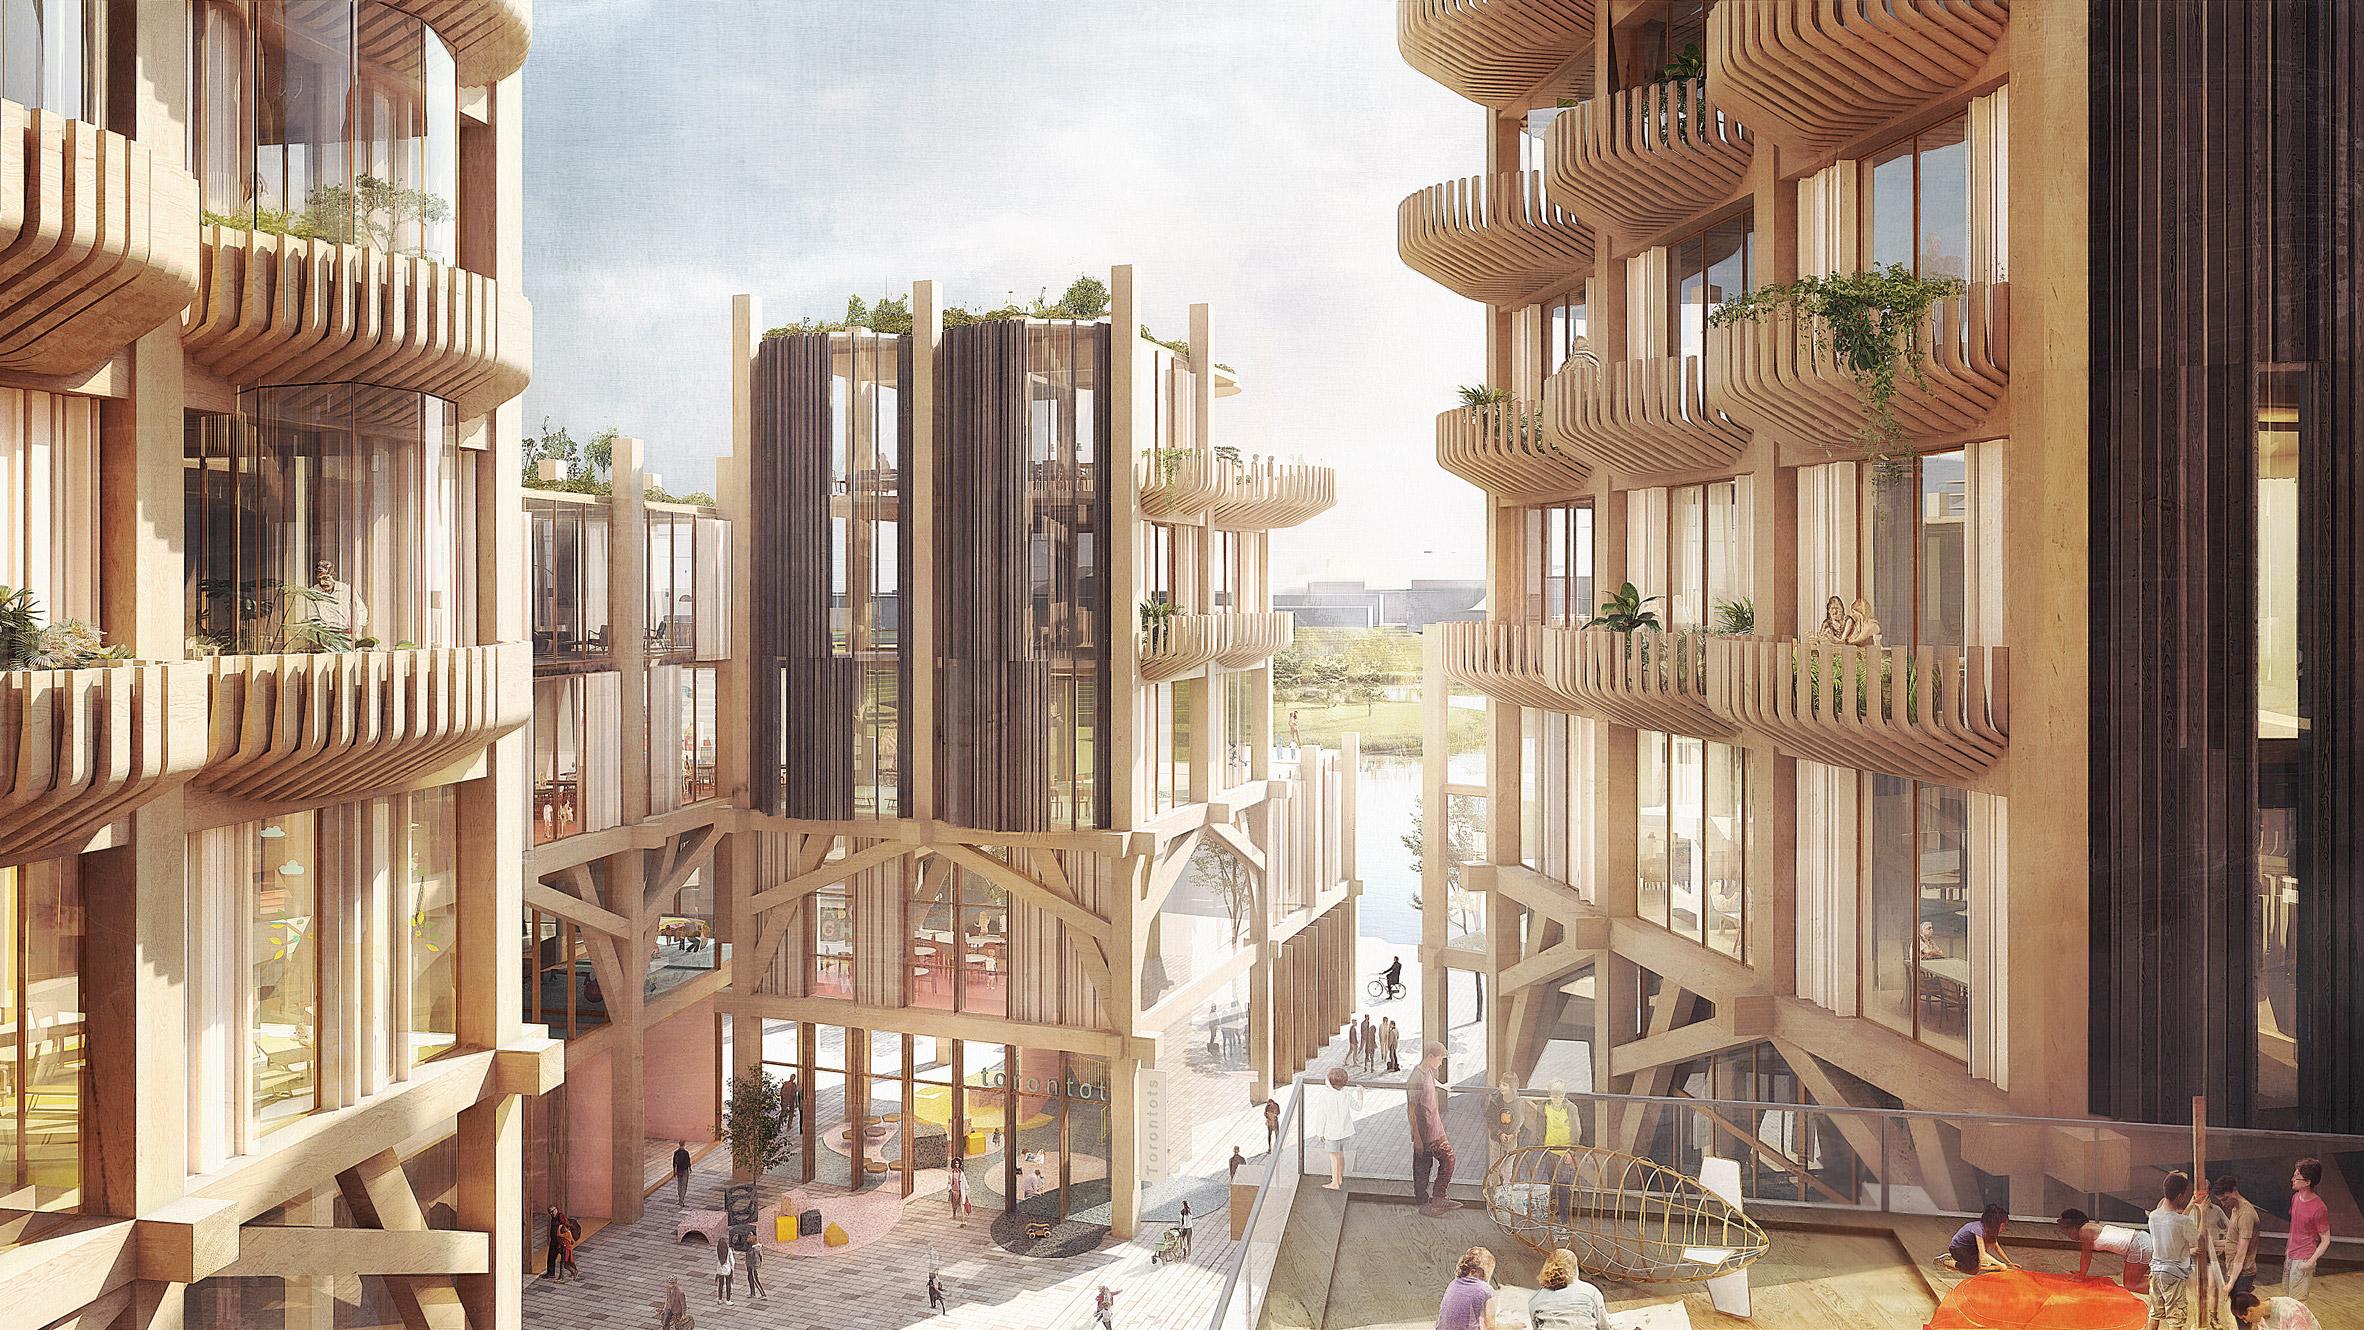 Construction Pergola Bois Plan snøhetta and heatherwick studio unveil designs for sidewalk